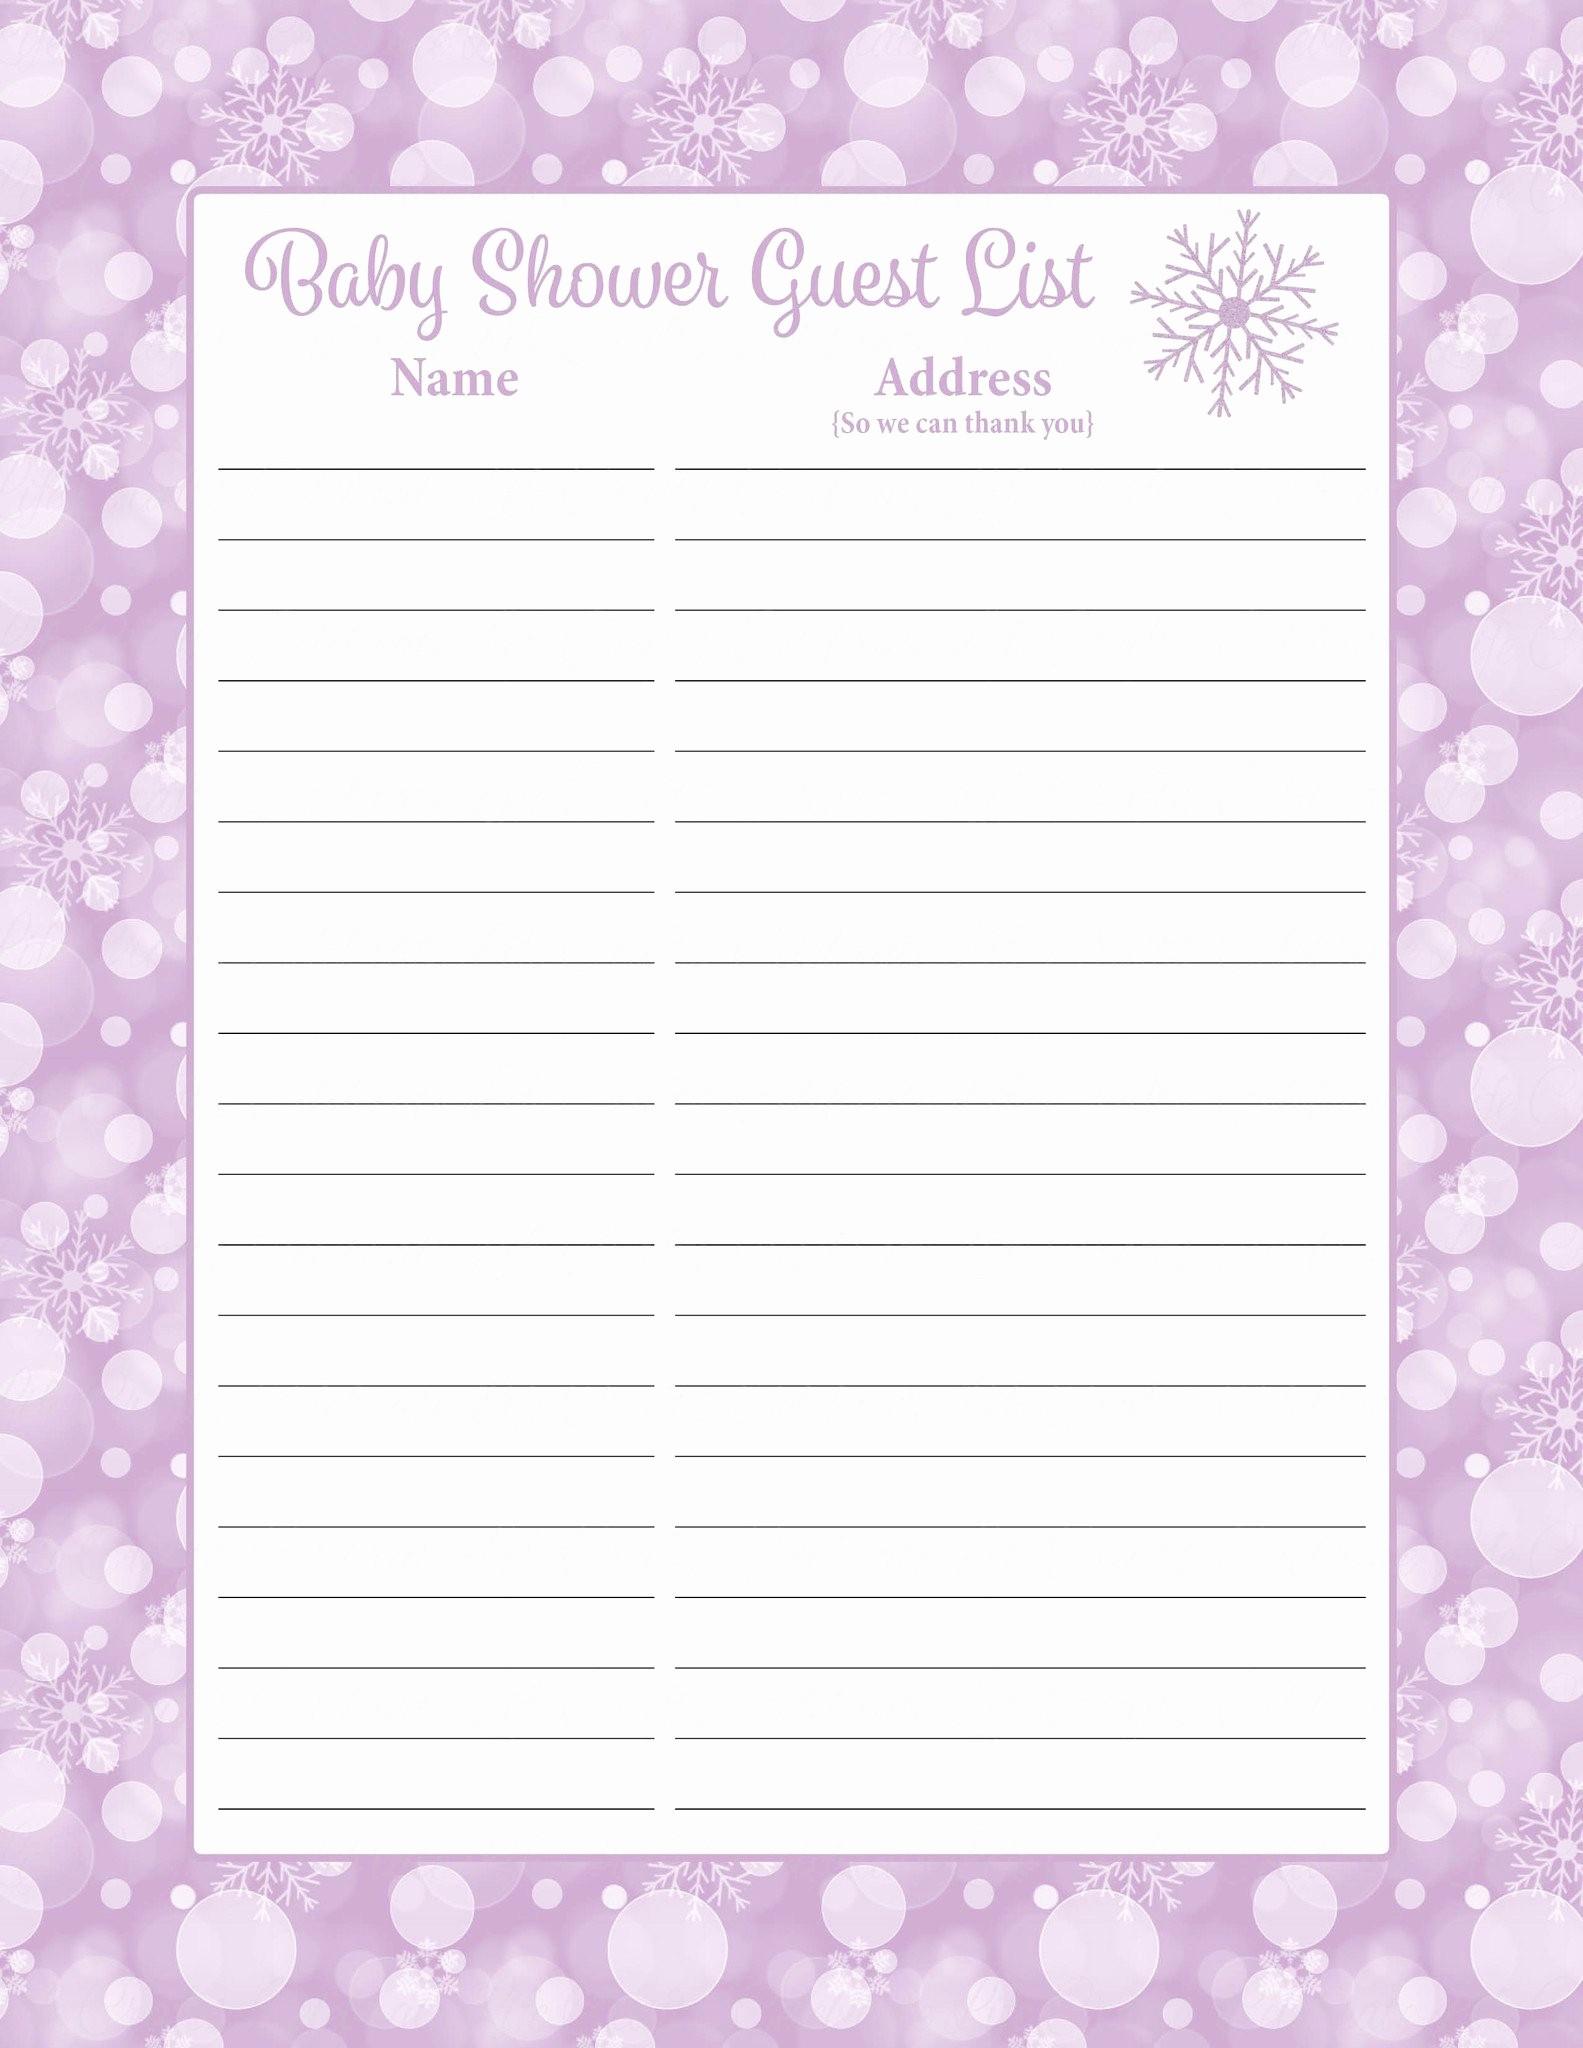 Baby Shower Guest List Printable Elegant Printable Baby Shower Guest List Portablegasgrillweber